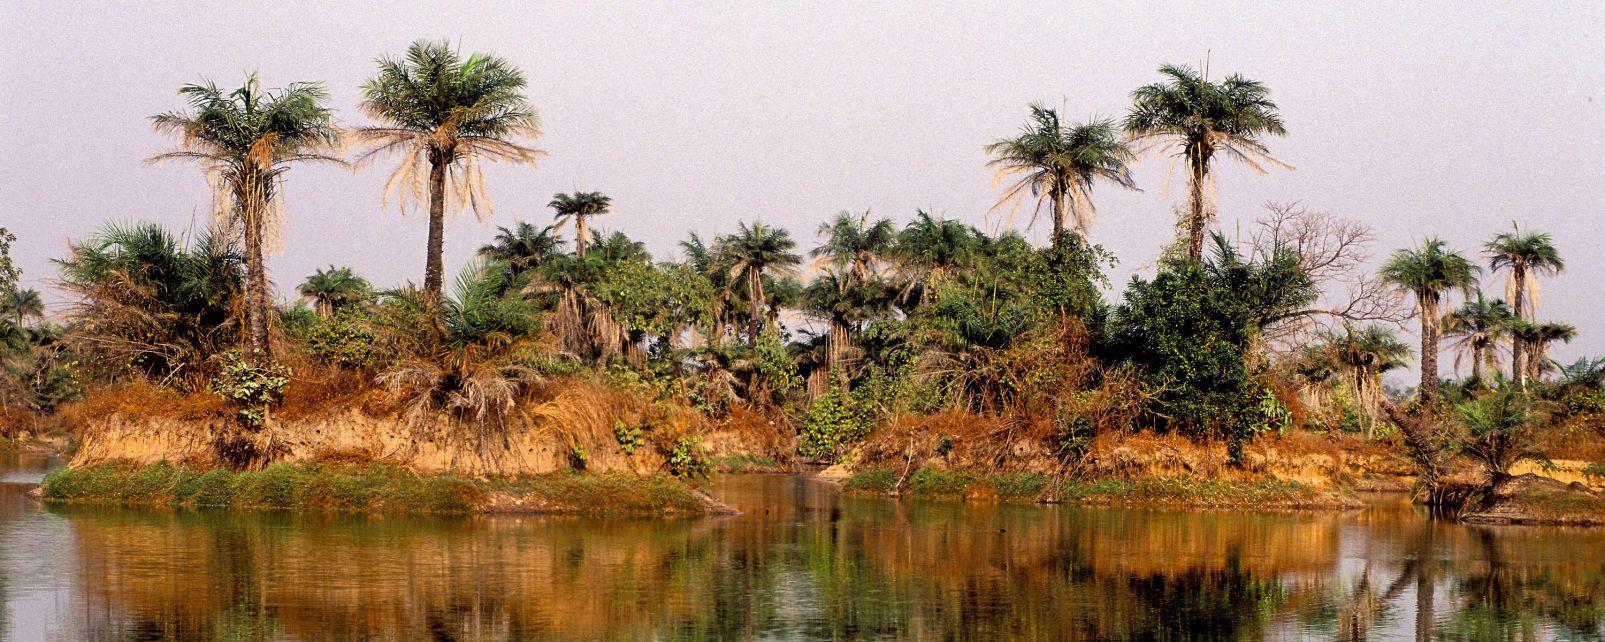 Casamance, Die Landschaften, Senegal